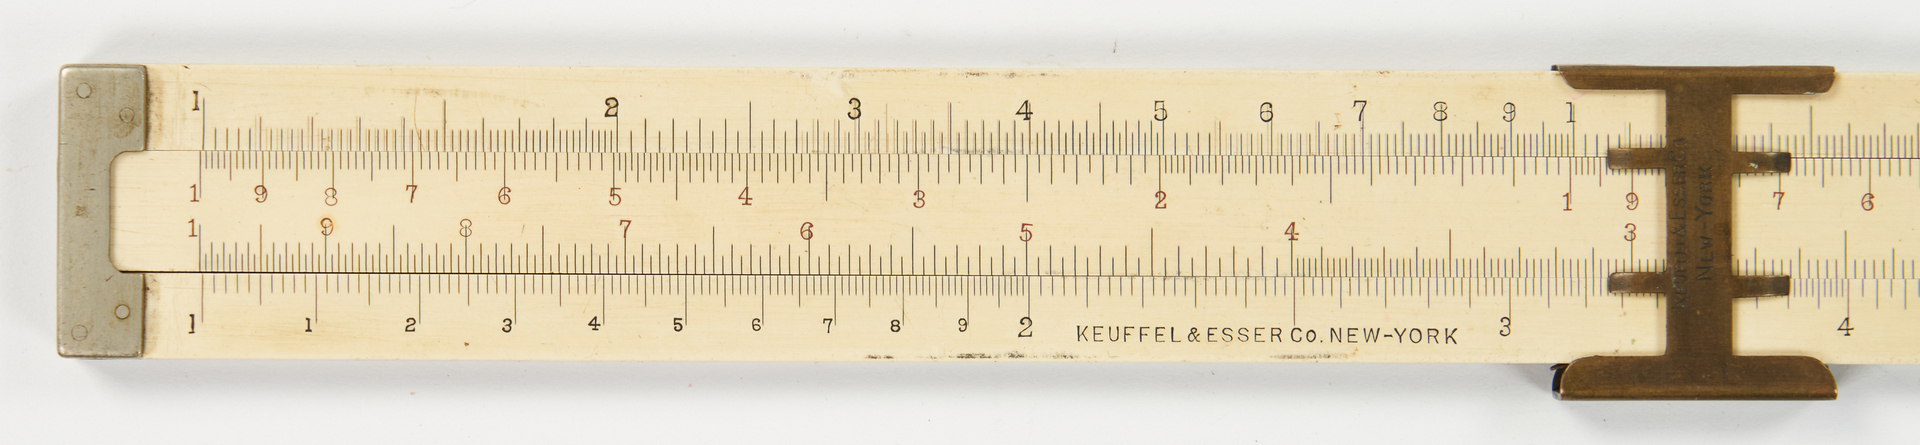 "Lot 1046: Keuffel and Esser 10"" Slide Rule"